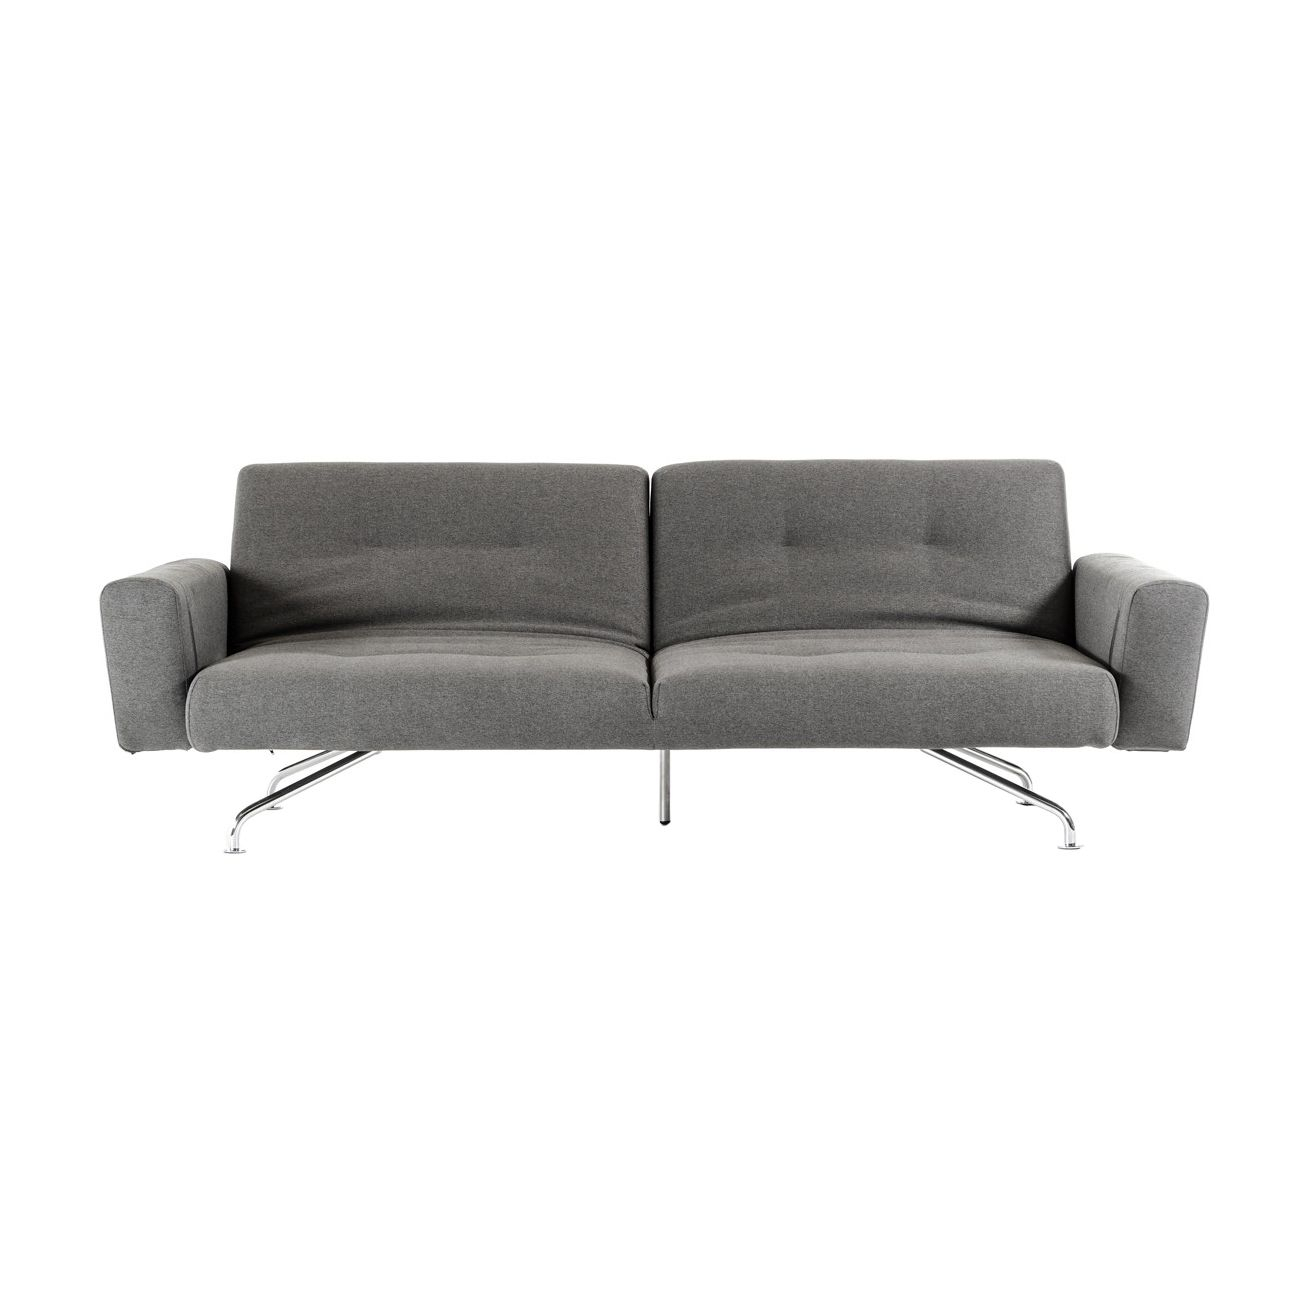 Aidan Convertible Sofa   Convertible Furniture   Pinterest   Mid Regarding Aidan Ii Sofa Chairs (Image 5 of 25)